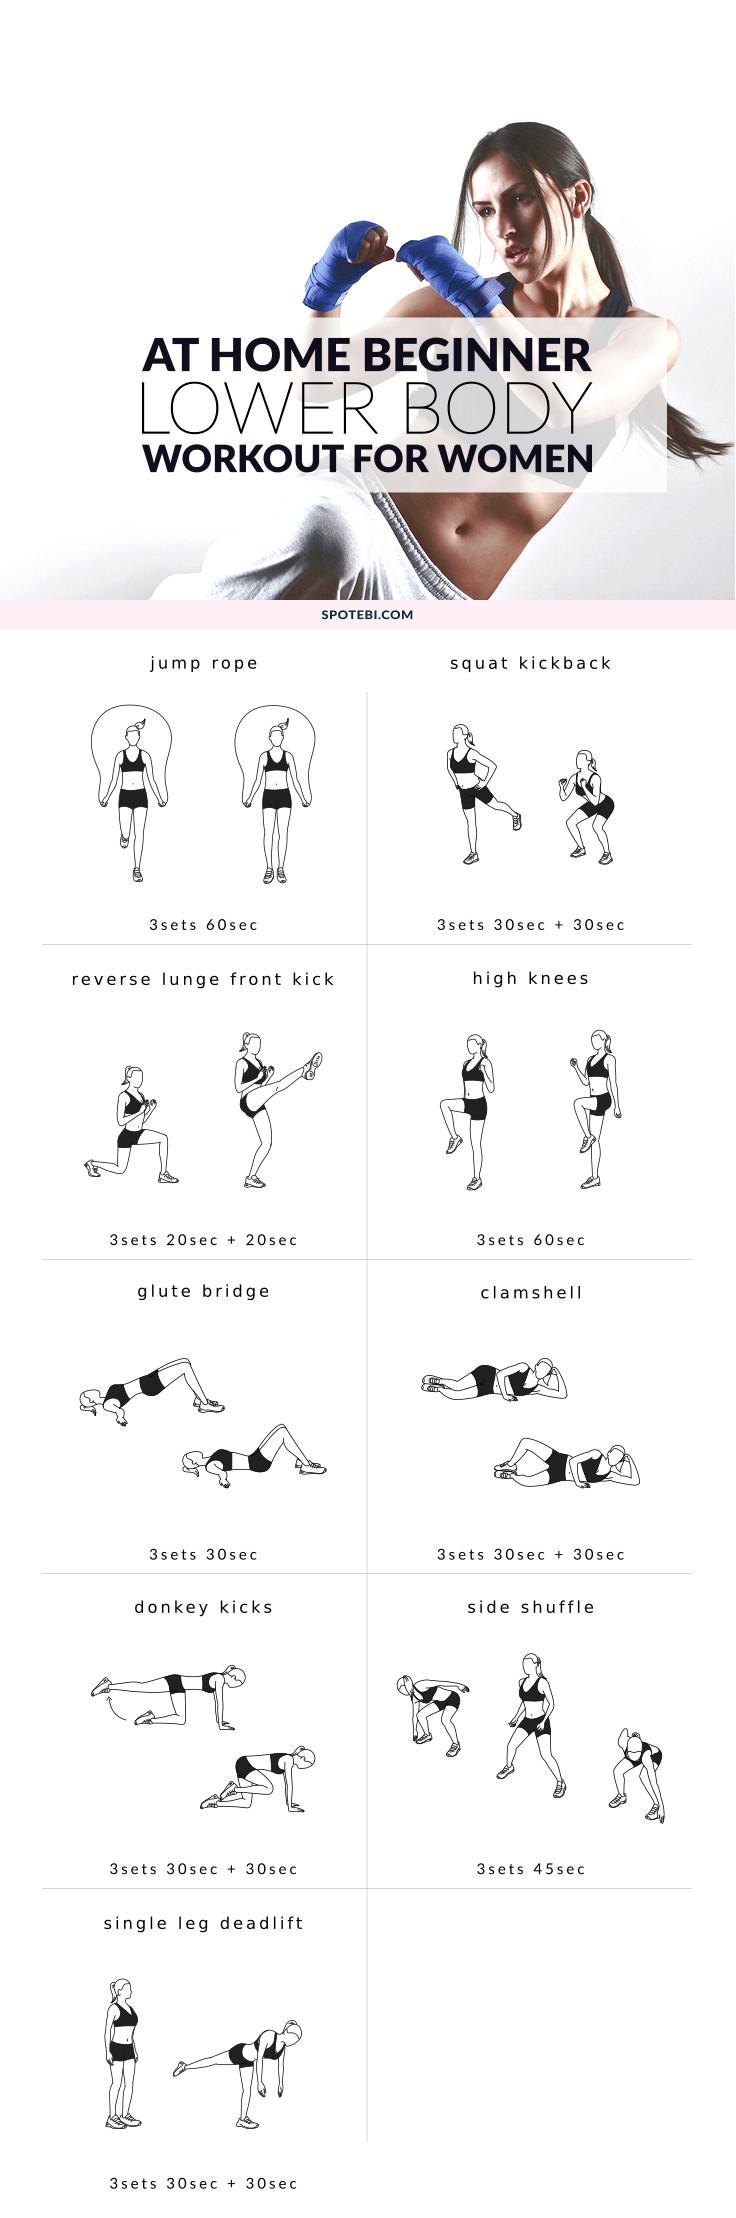 lower-body-beginner-workout-for-women-736x2218